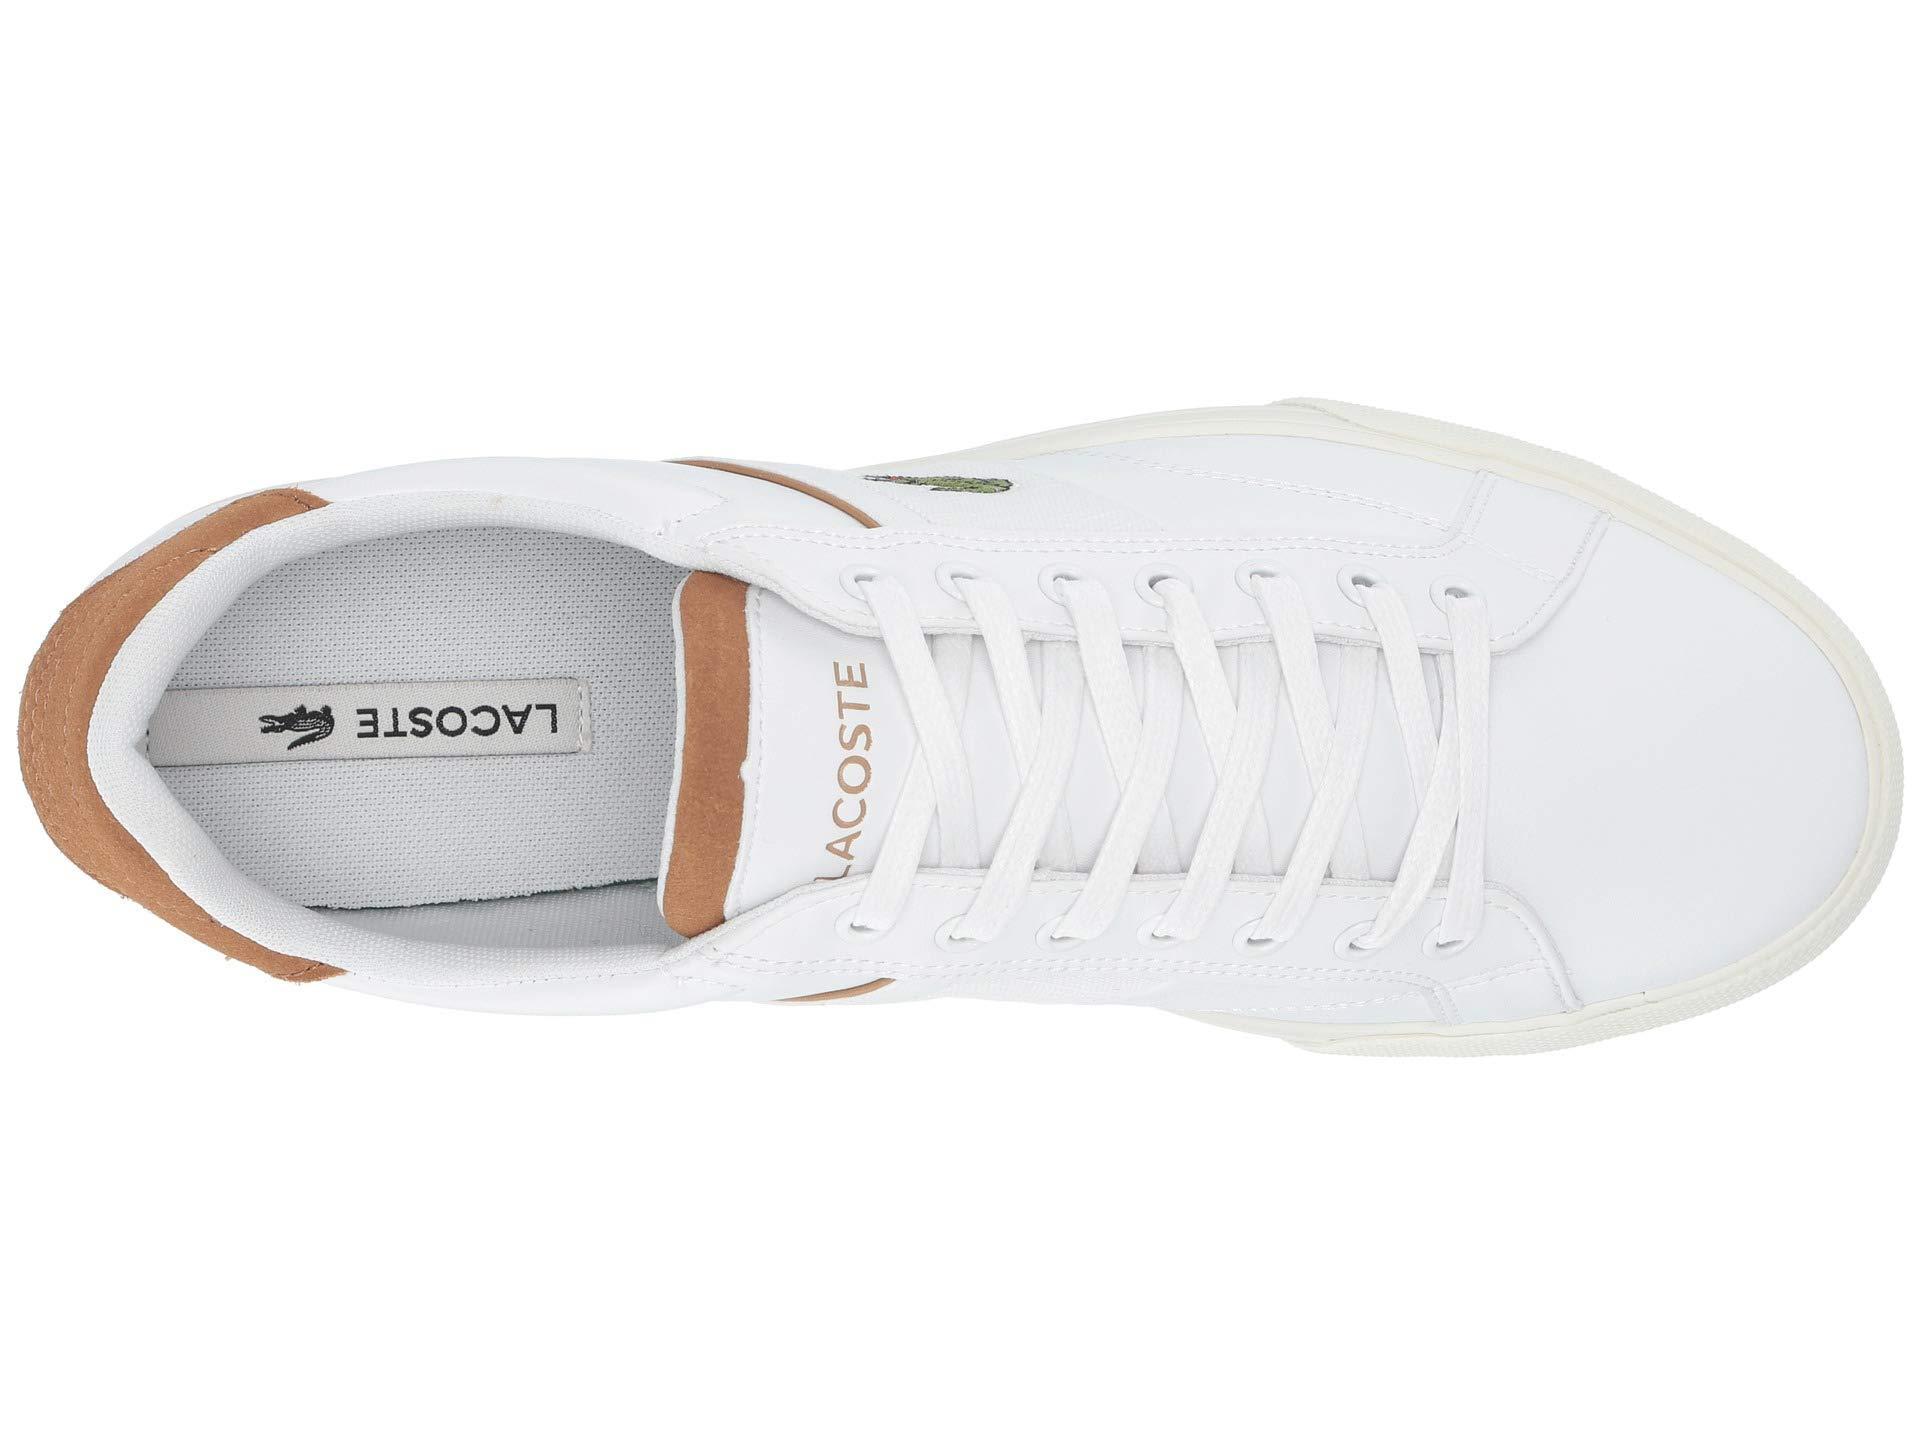 2fd4e289d3df5b Lacoste - White Fairlead 119 1 Cma (black light Brown) Men s Shoes for.  View fullscreen